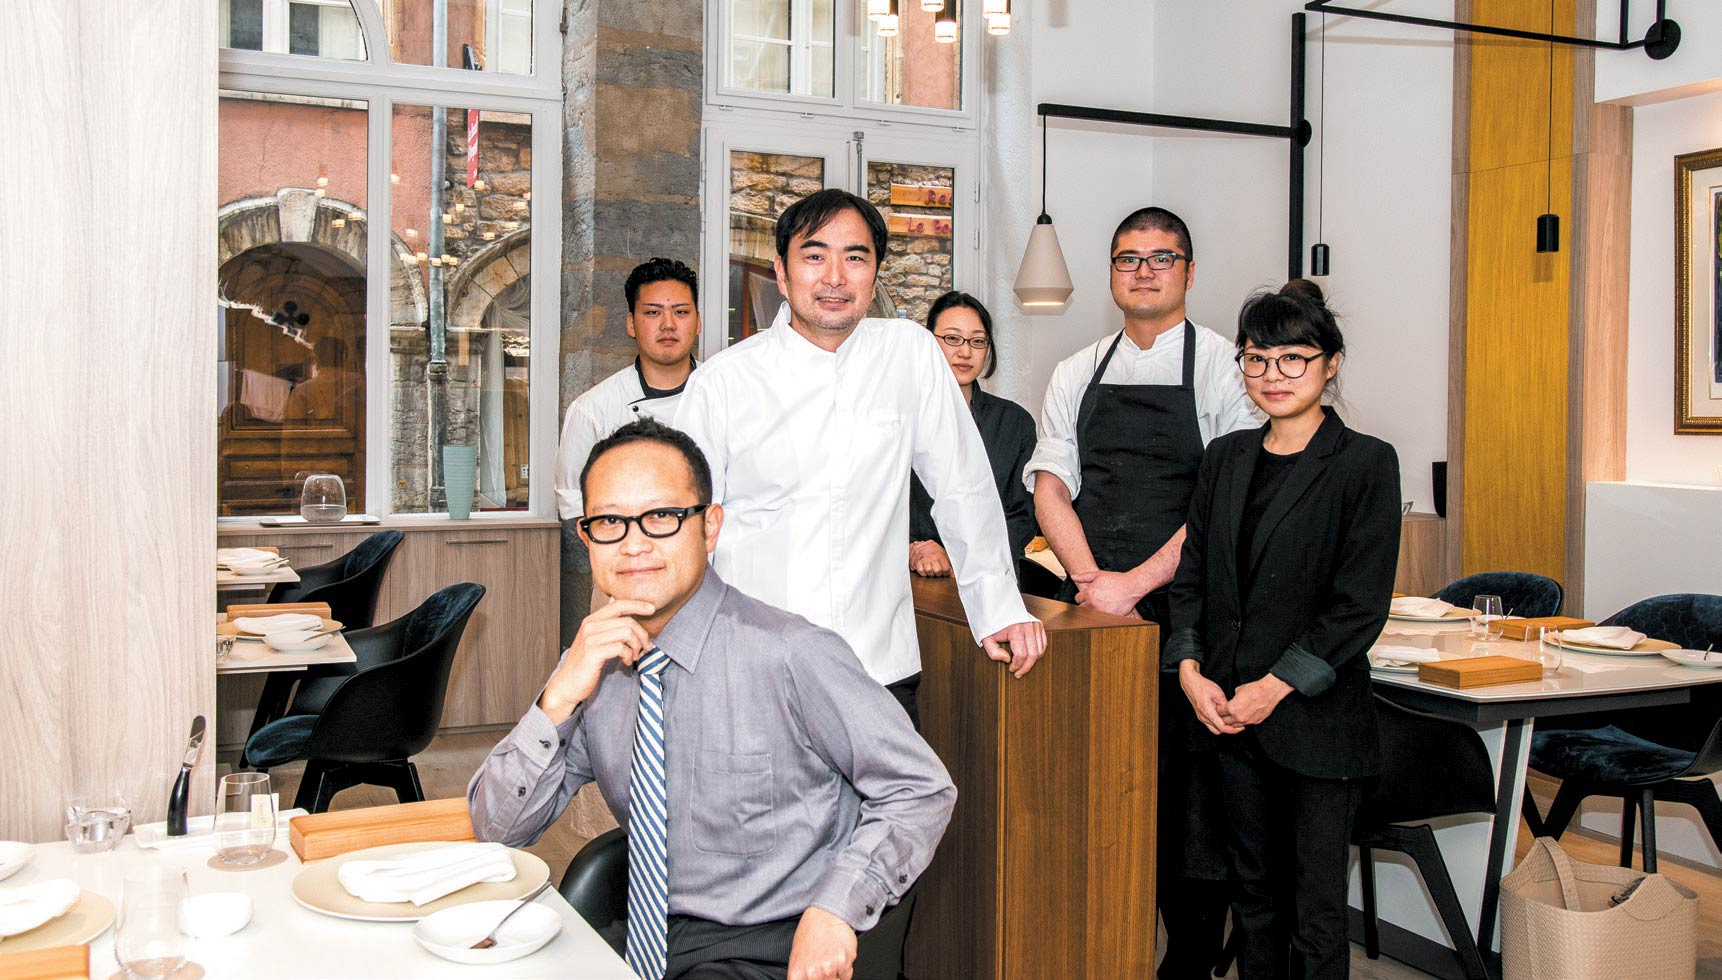 Restaurant Au 14 Février Vieux Lyon - Tsuyoshi Arai